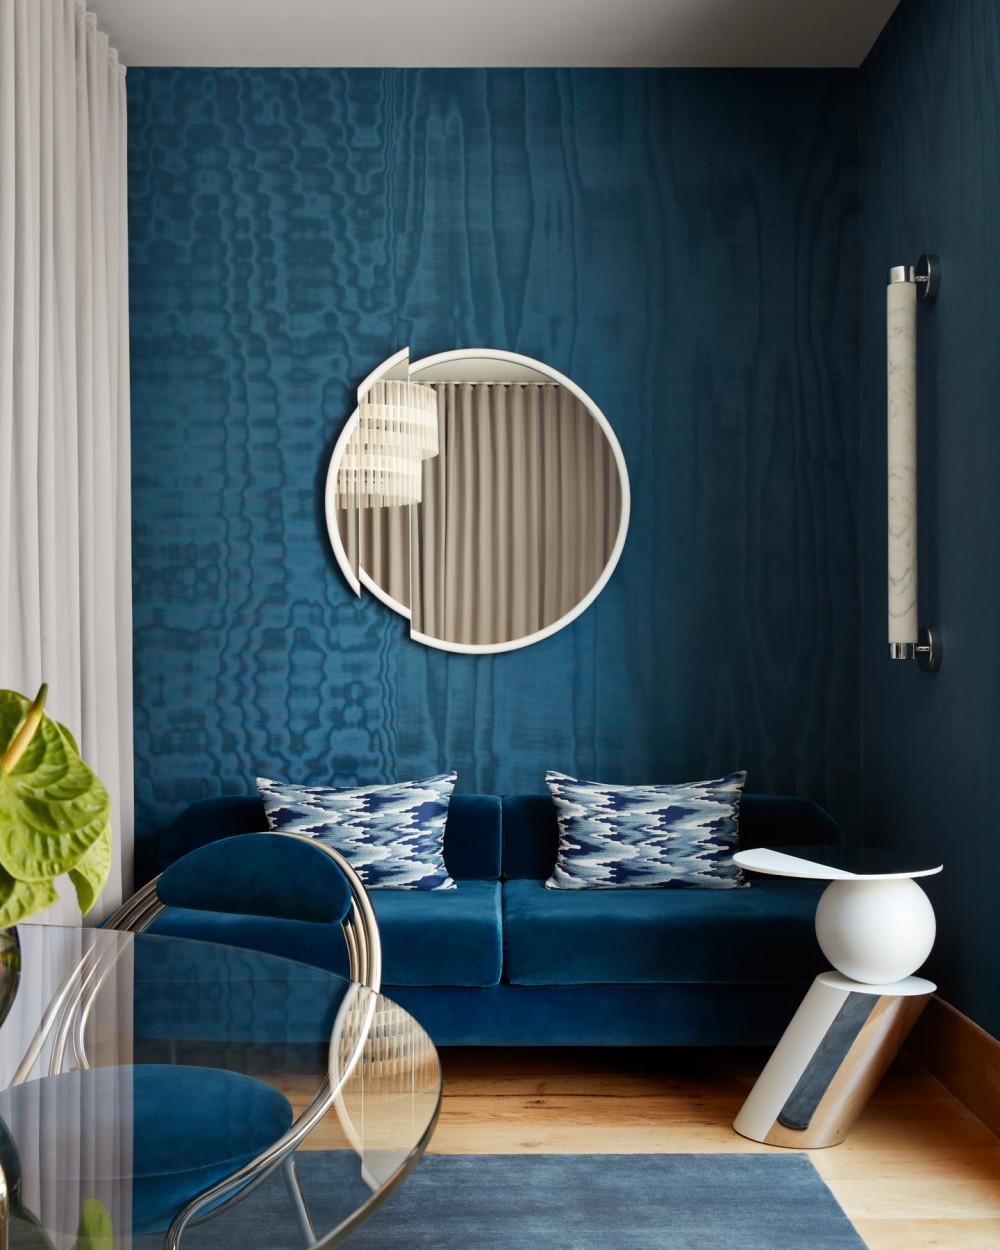 leebroom-living-room-skj-009.jpg